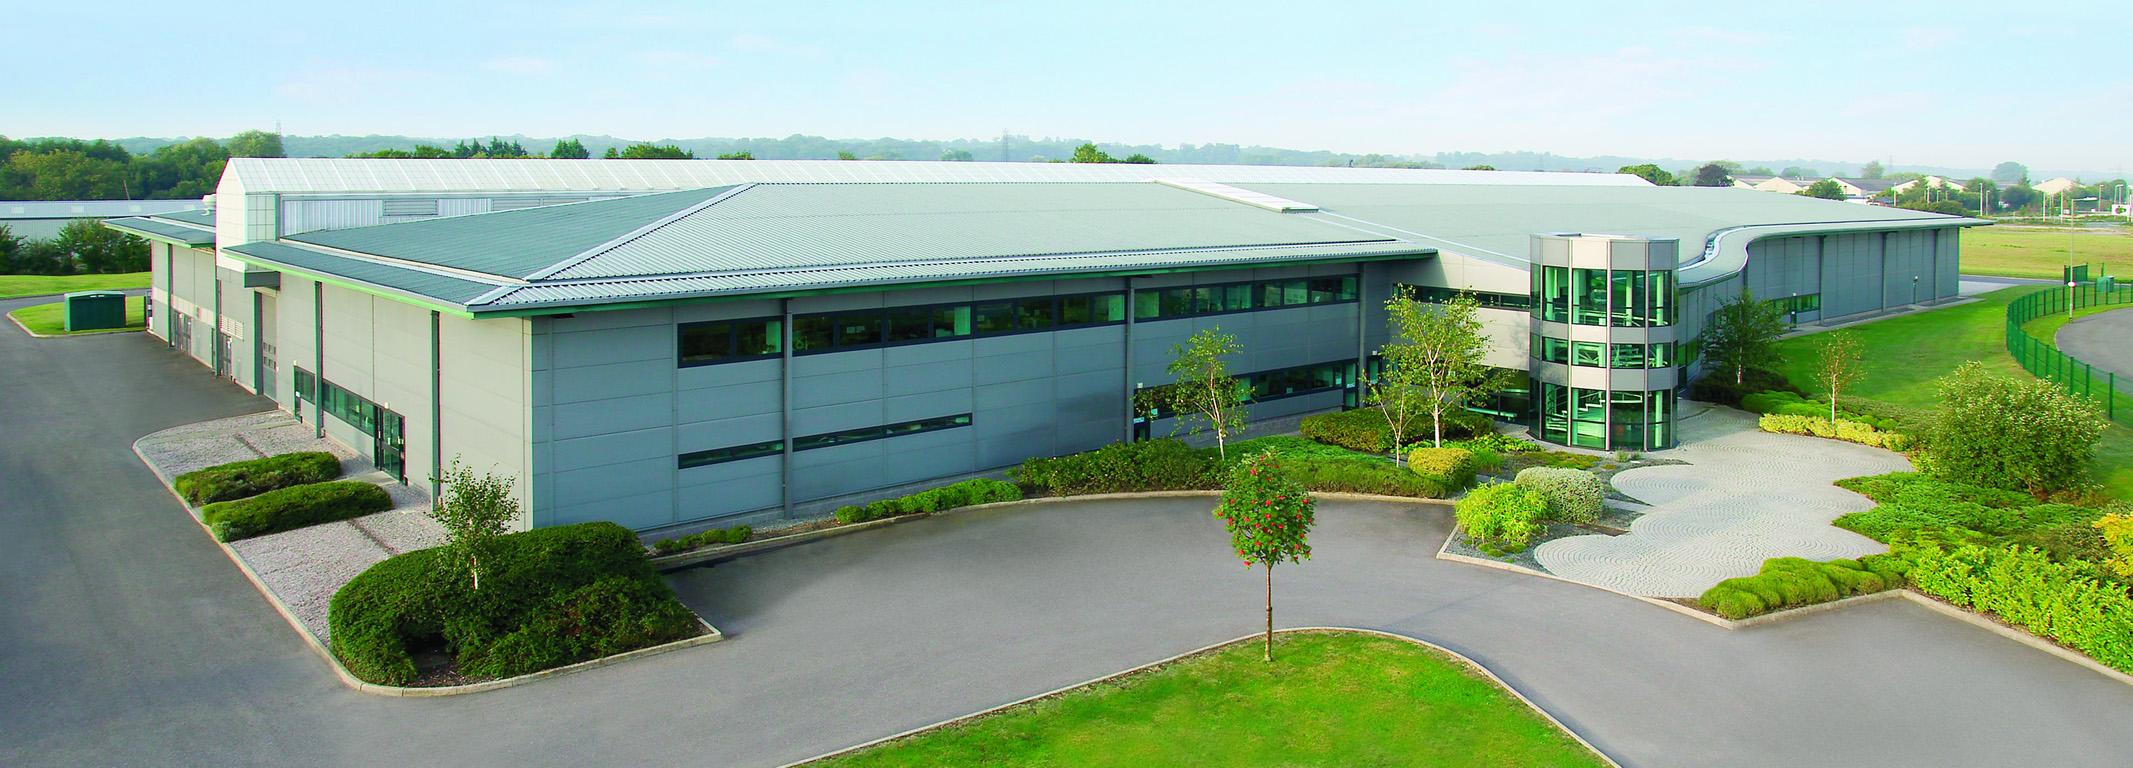 Xtrac_Limiteds_UK_headquarters_in_Berkshire.jpg